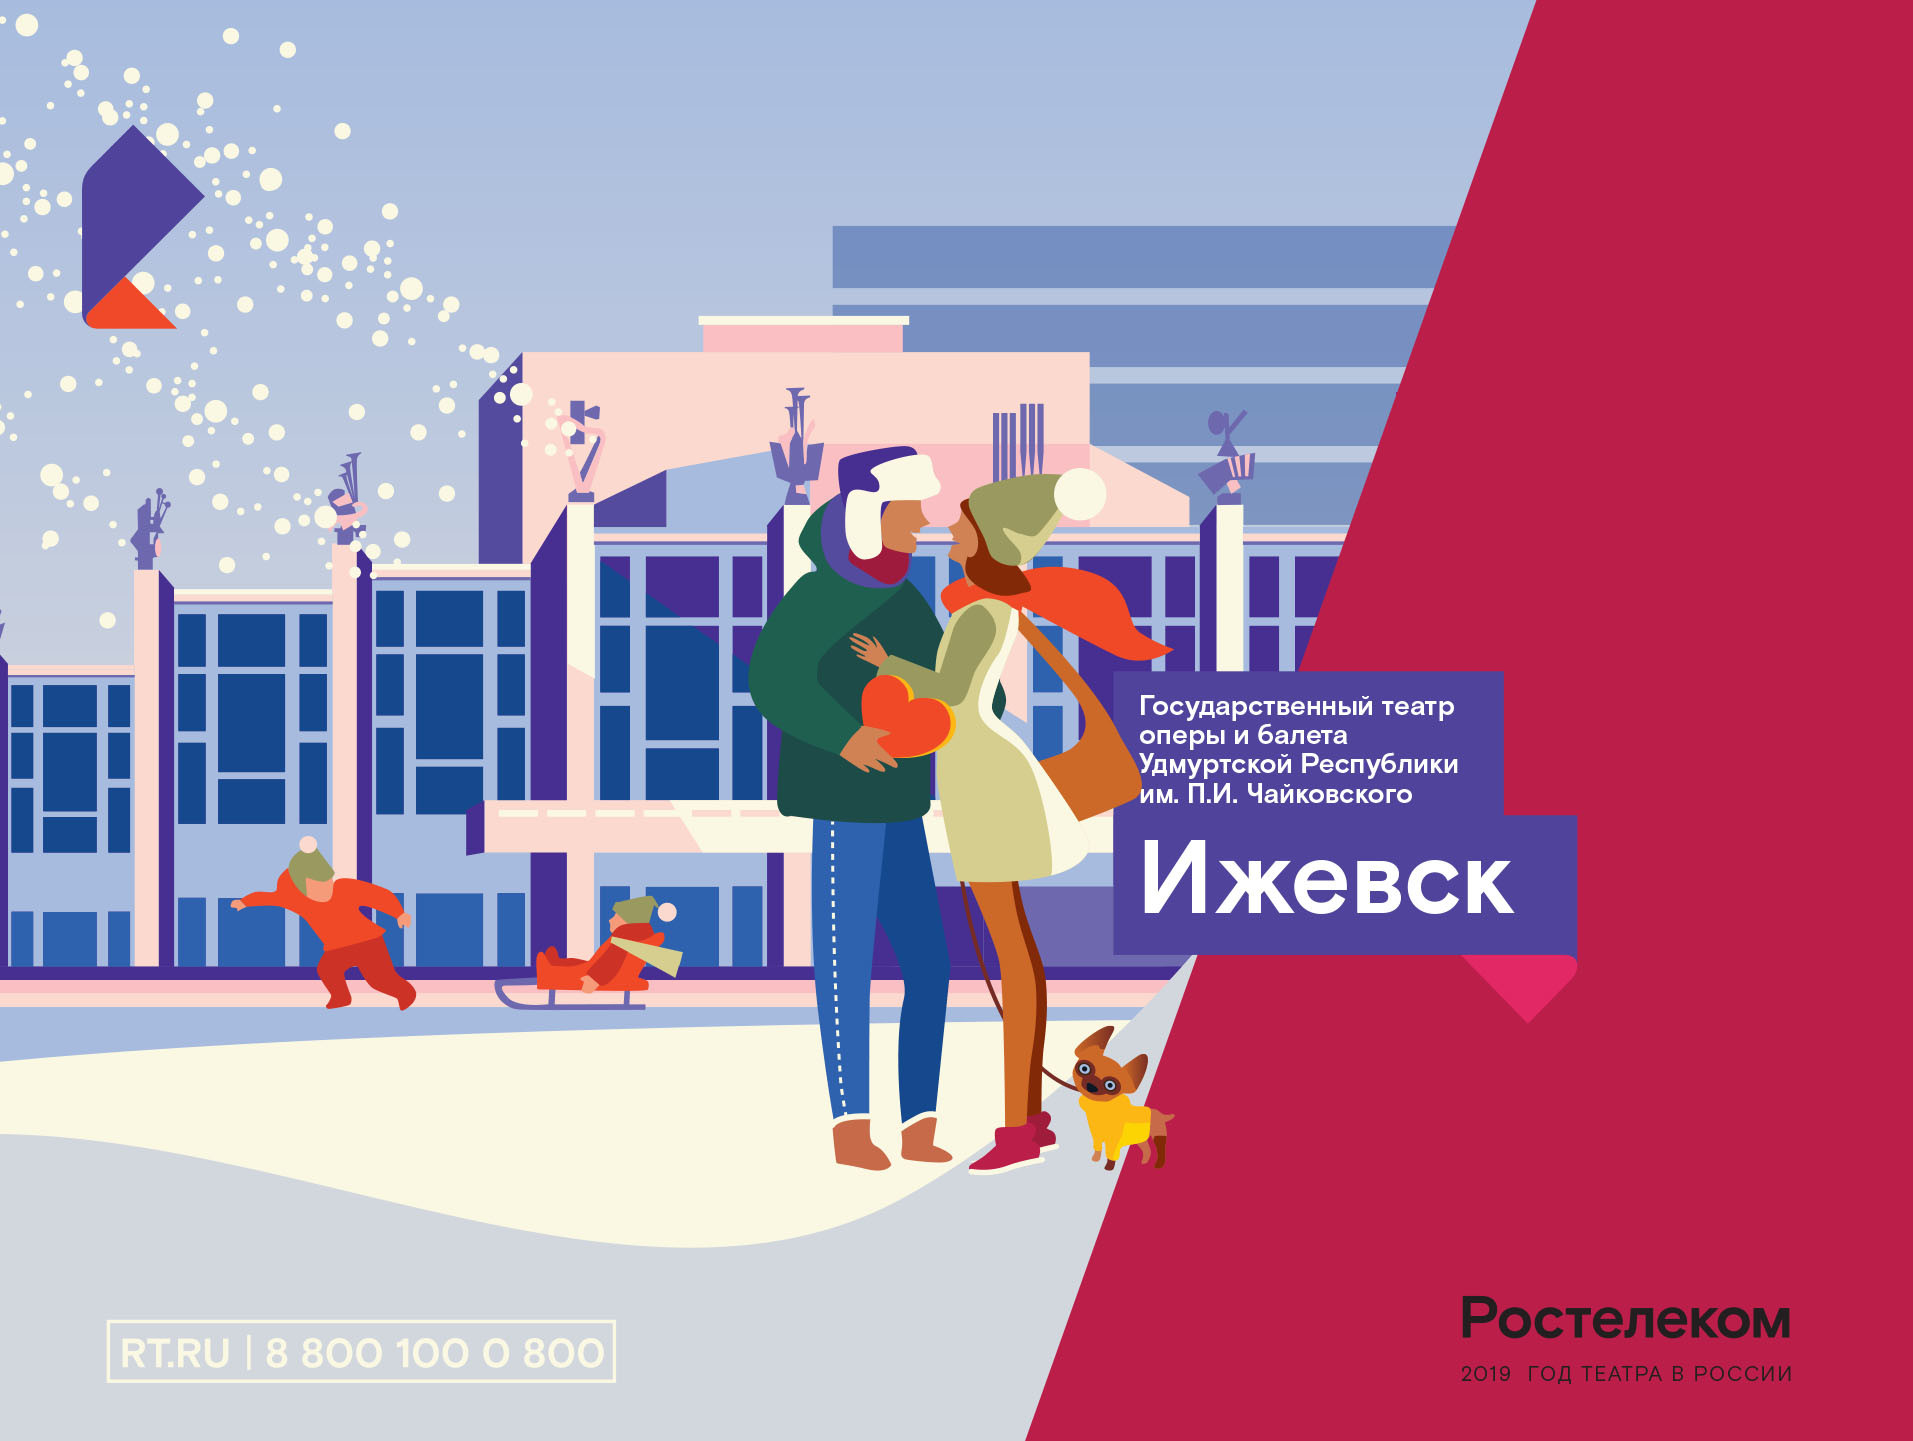 Axana zasorina rostelecom1 copy 2